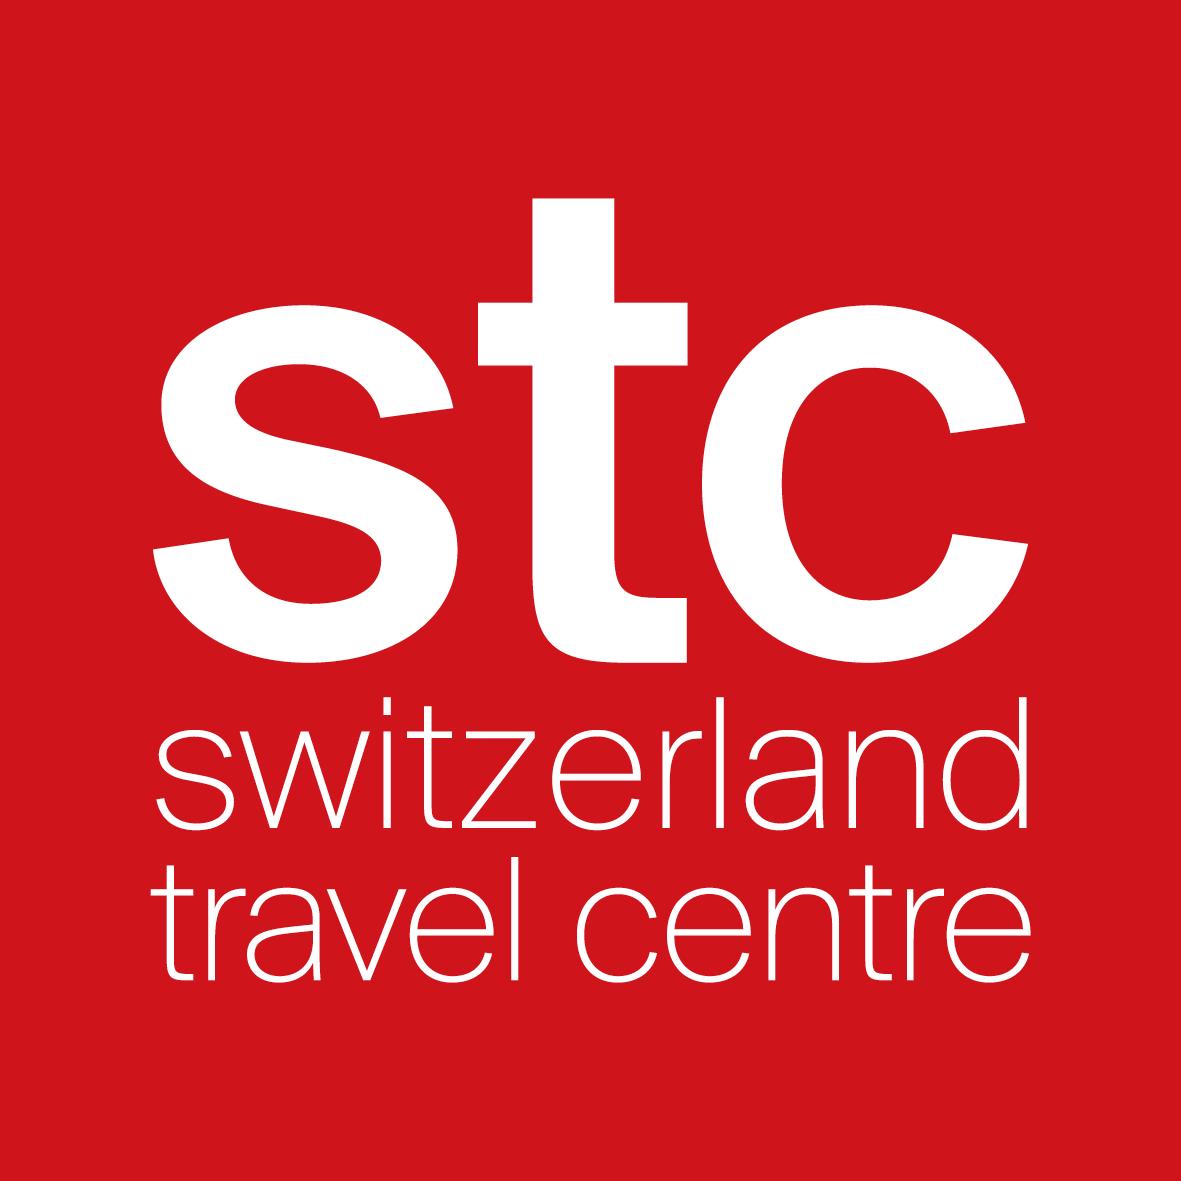 Switzerland Travel Centre